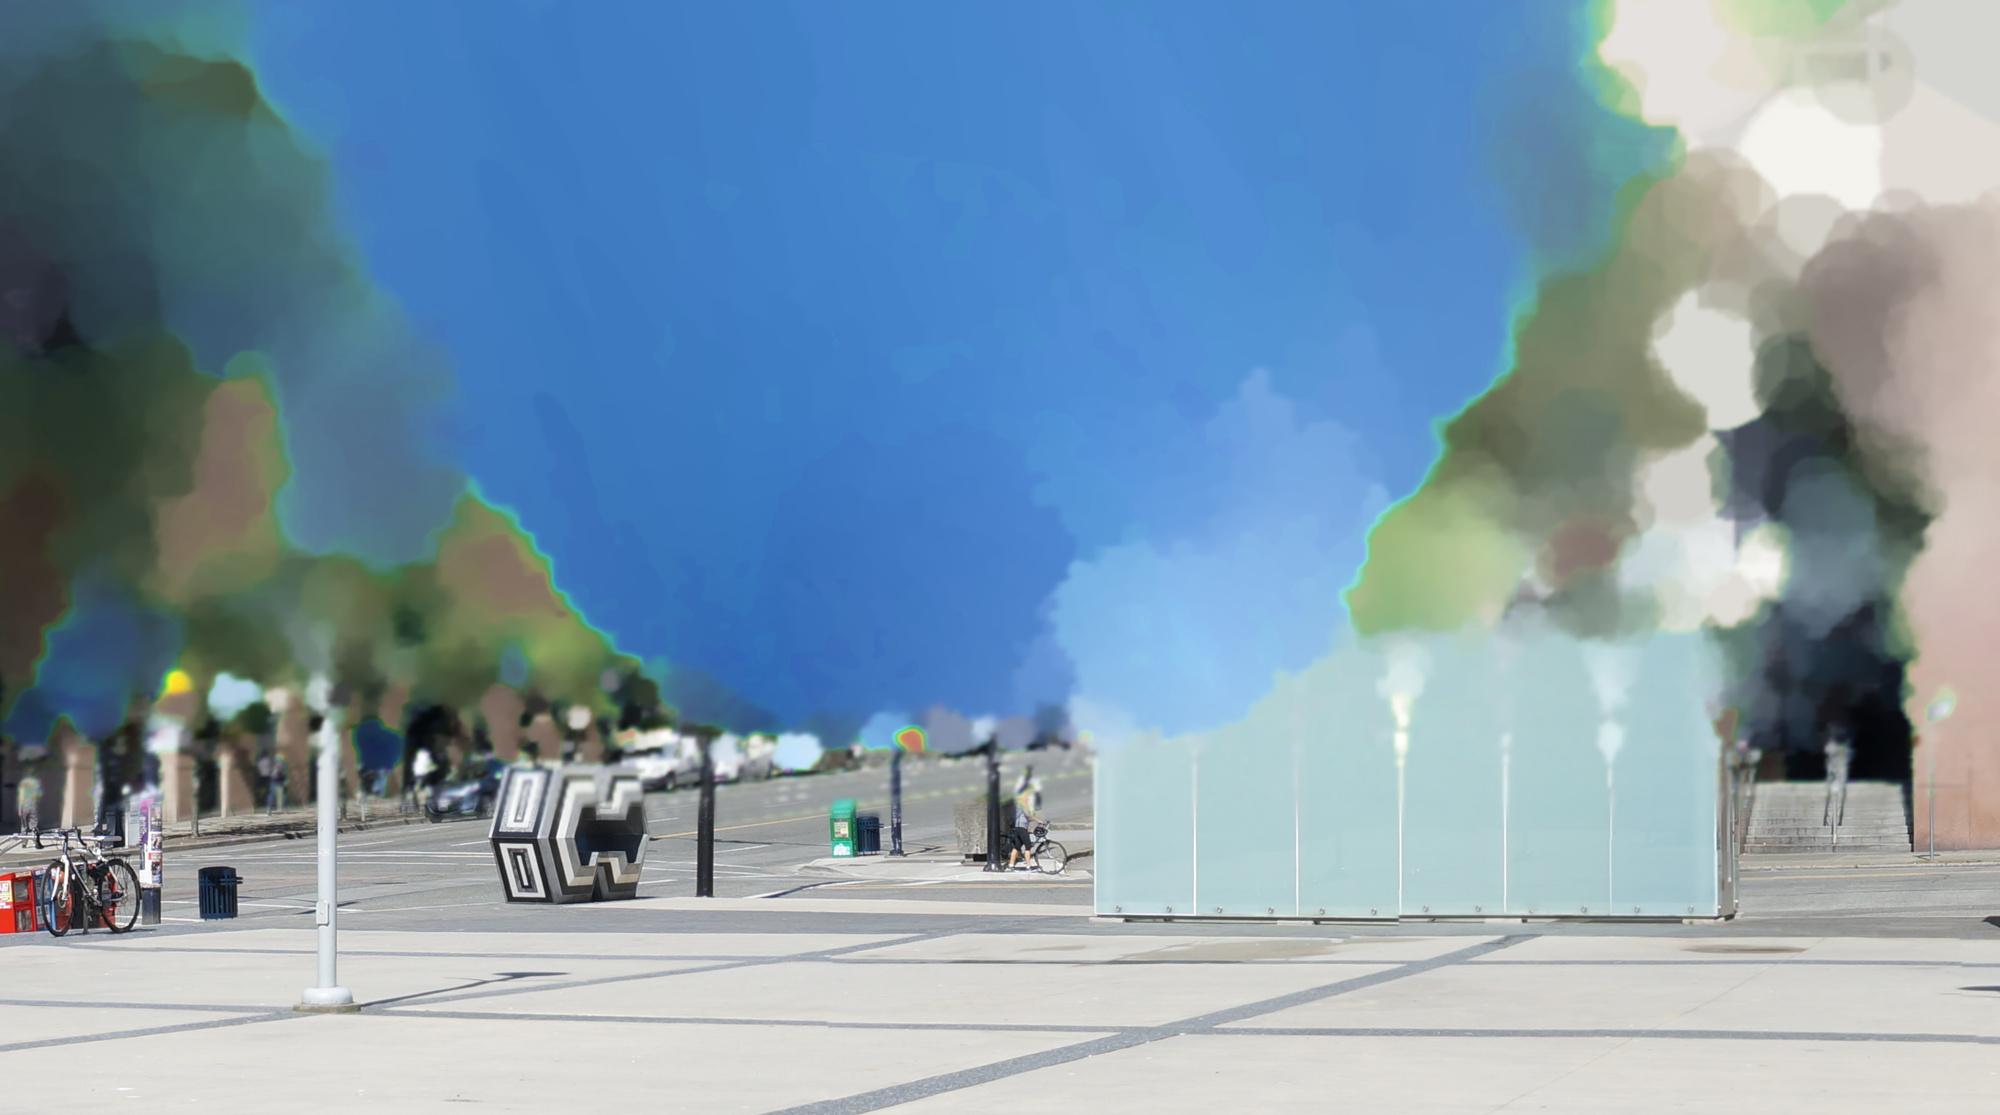 Bogart-Platforms-Coastal-City-In-Progress-Detail